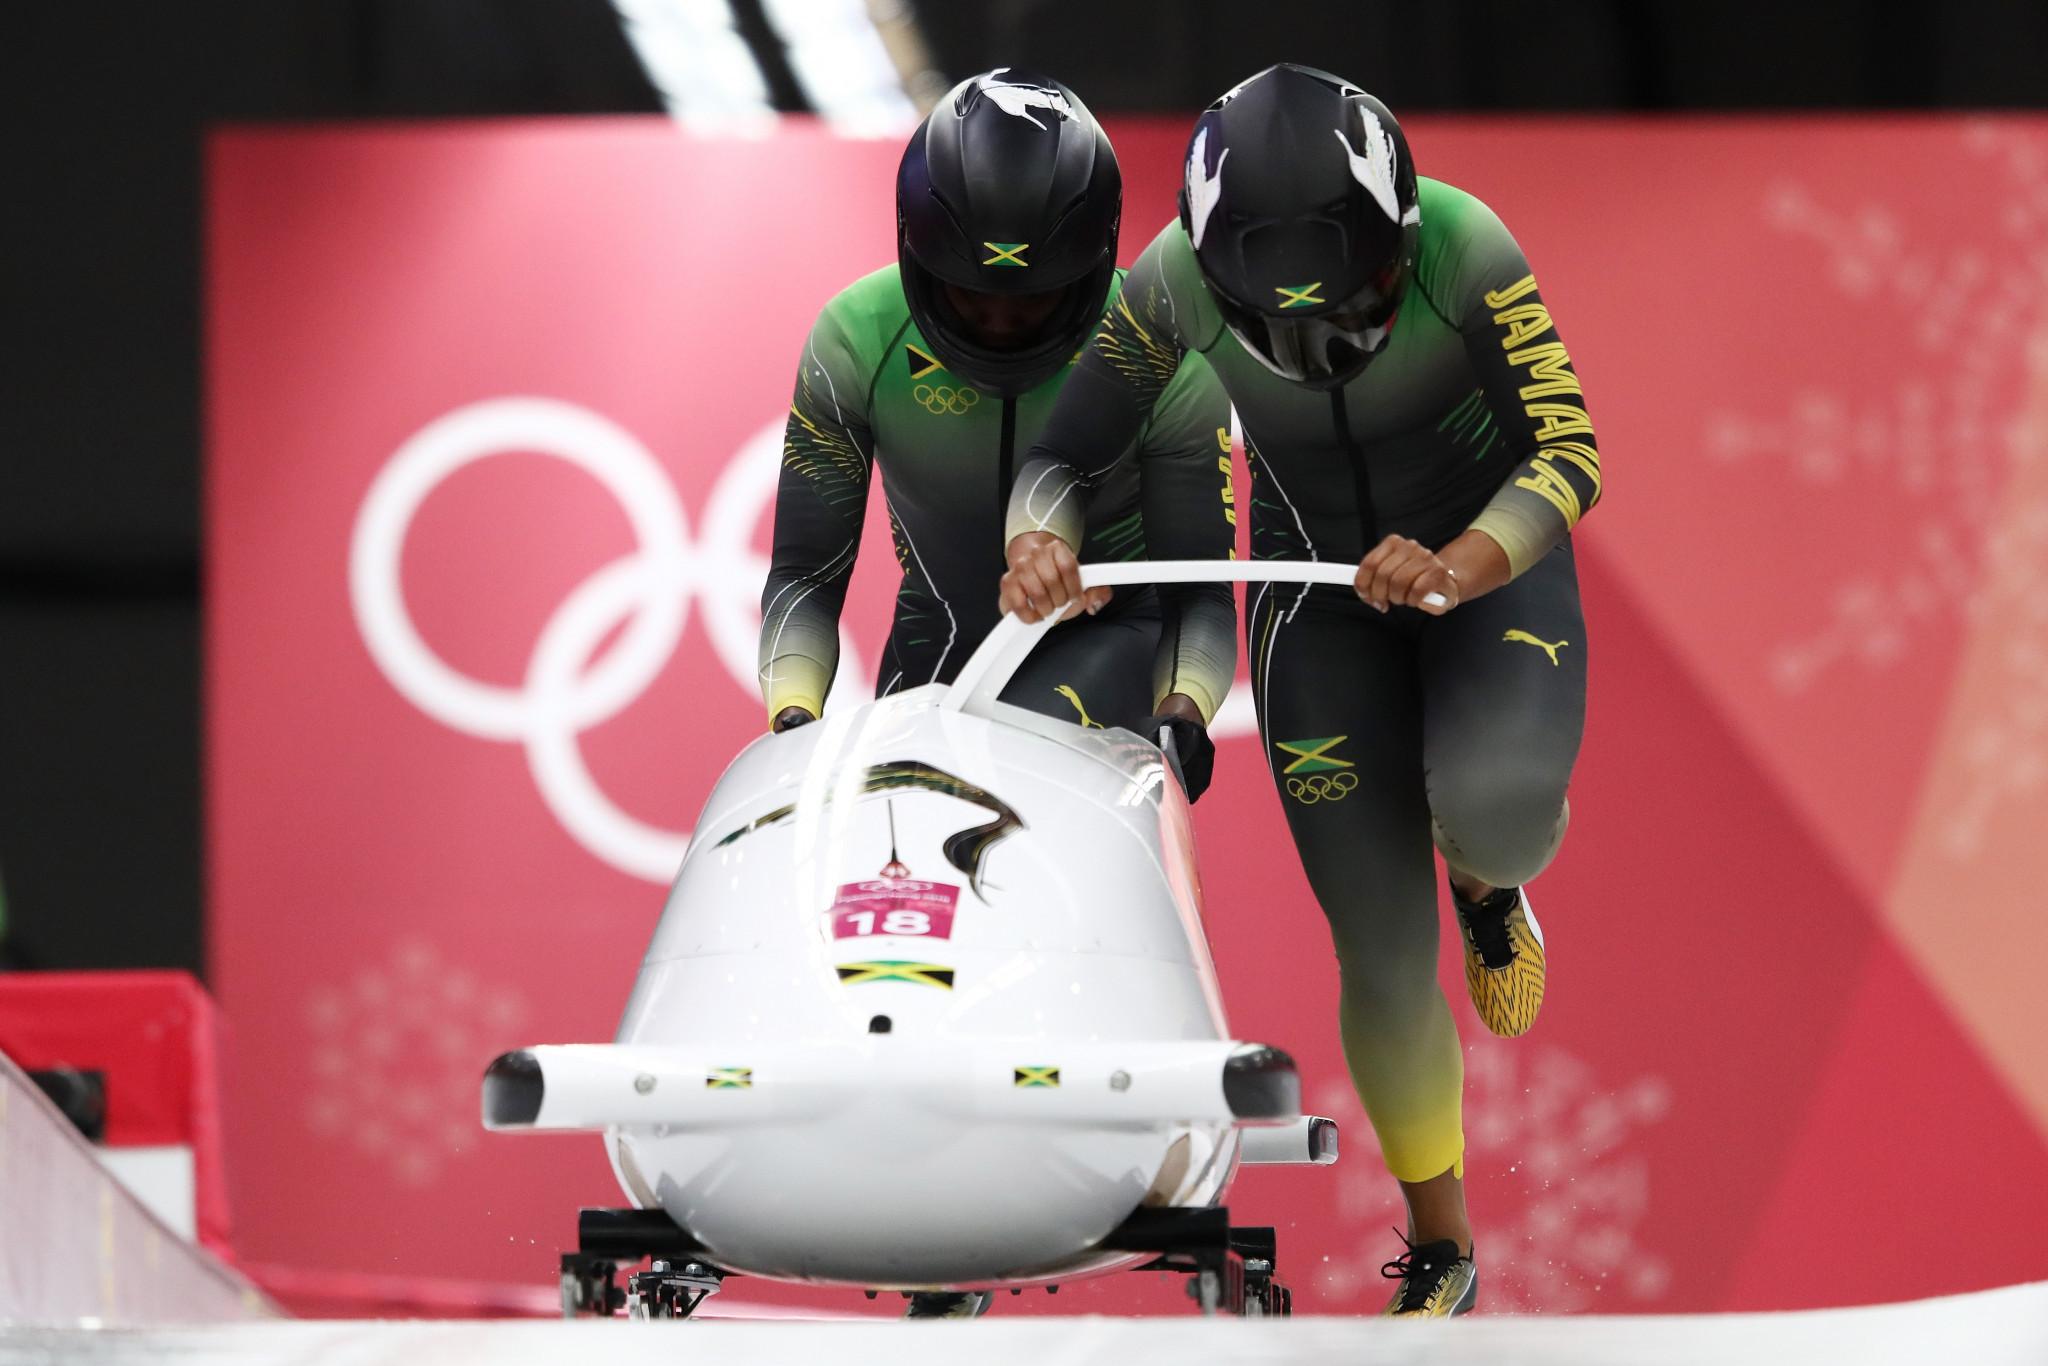 Jamaican women's bobsleigh team member failed drugs test month before Pyeongchang 2018